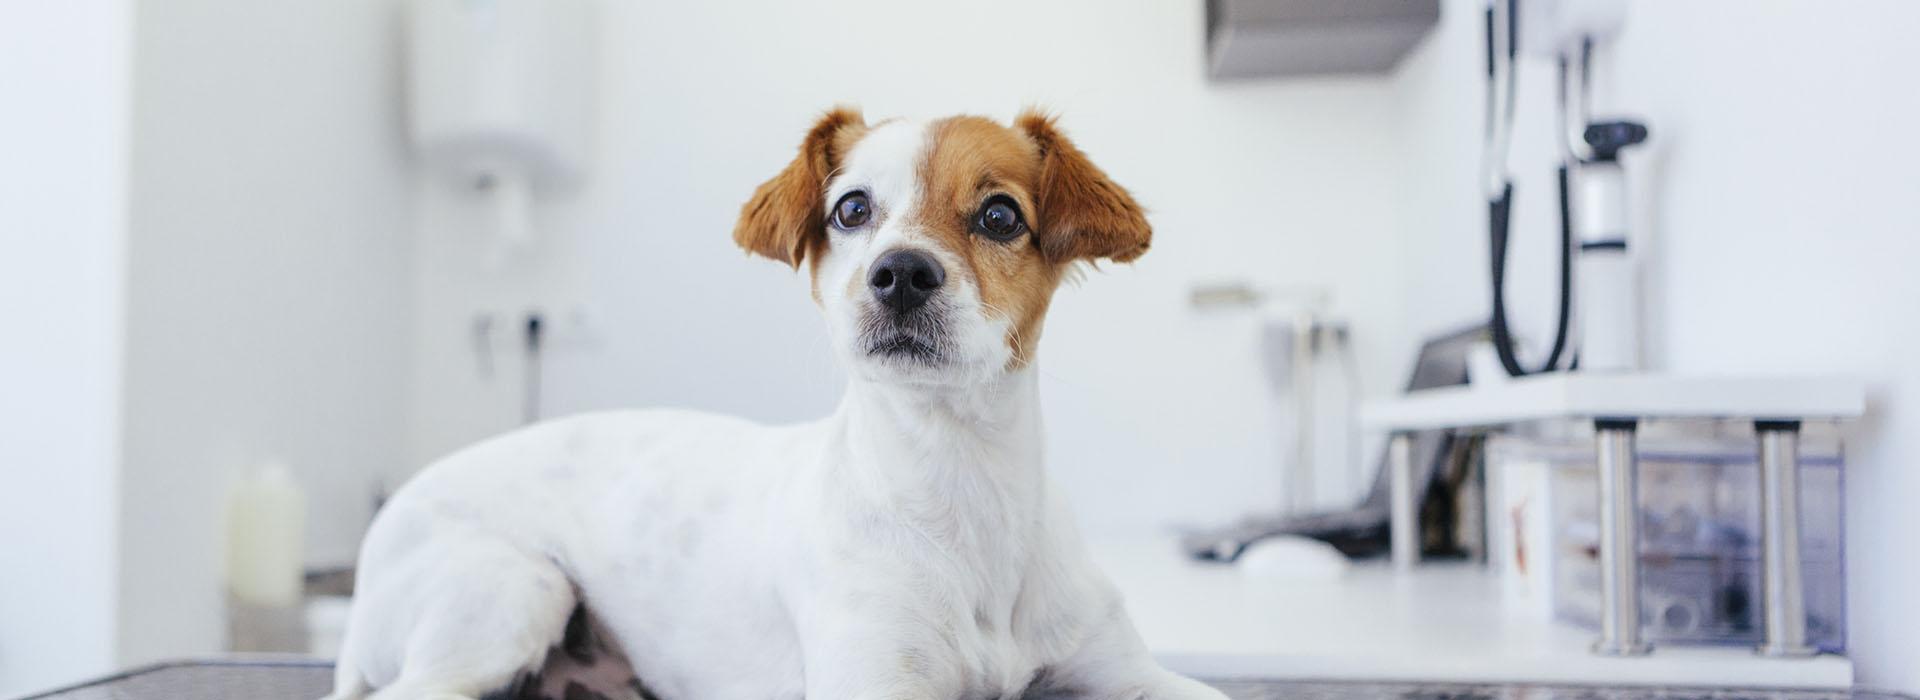 cabinet-veterinaire-terwagne-uccle